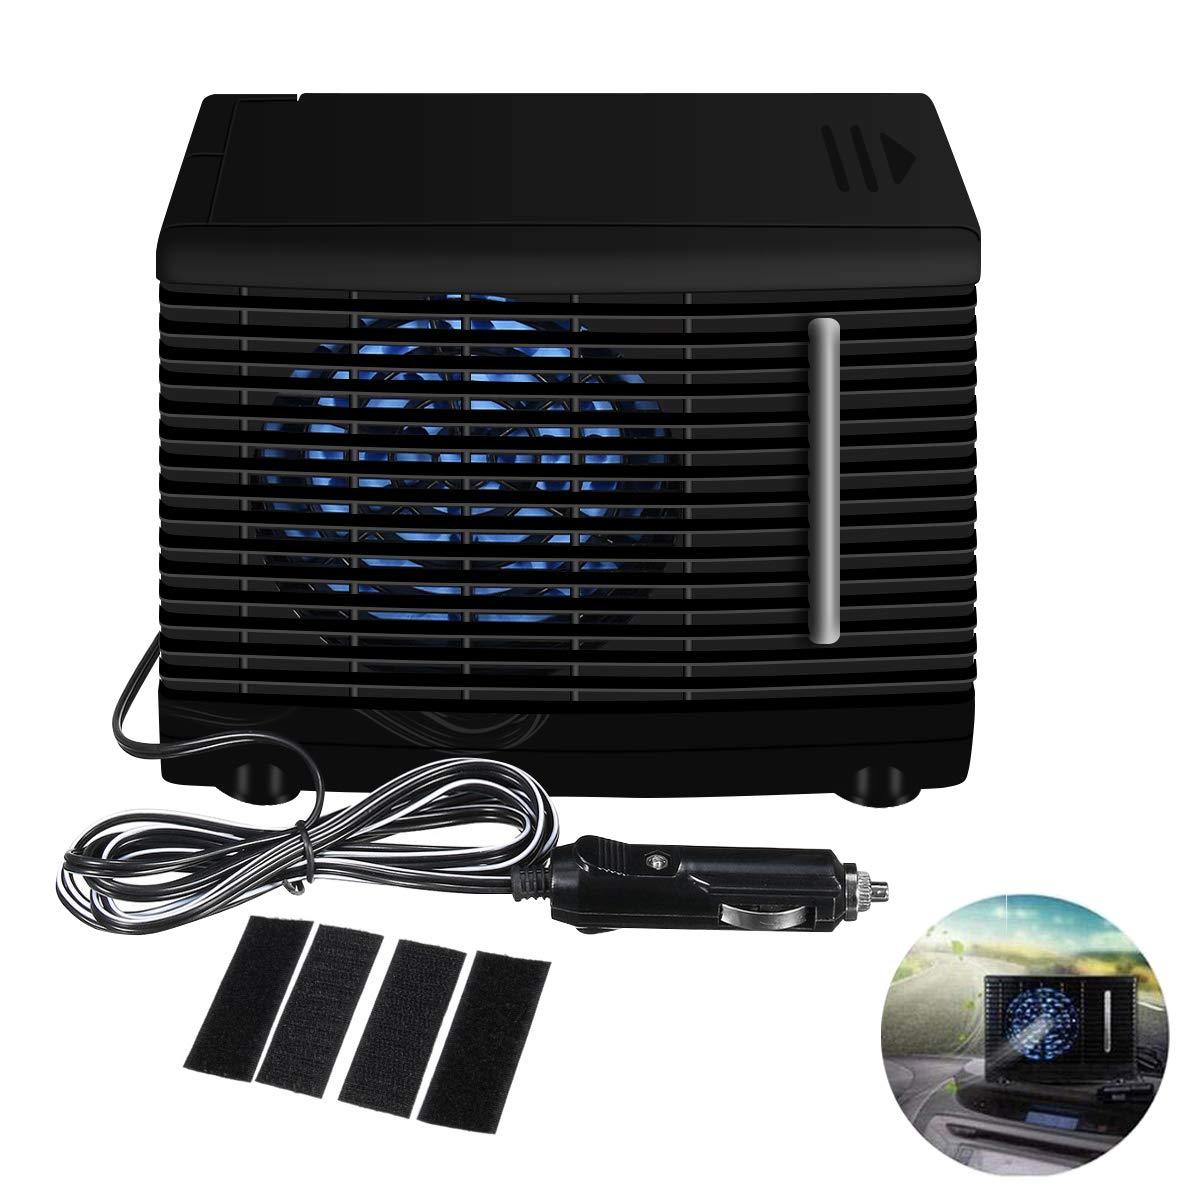 ACMEDE Car Air Conditioner DC12V Portable Car Cooler Cooling Fan Mini Evaporative Air Cooler